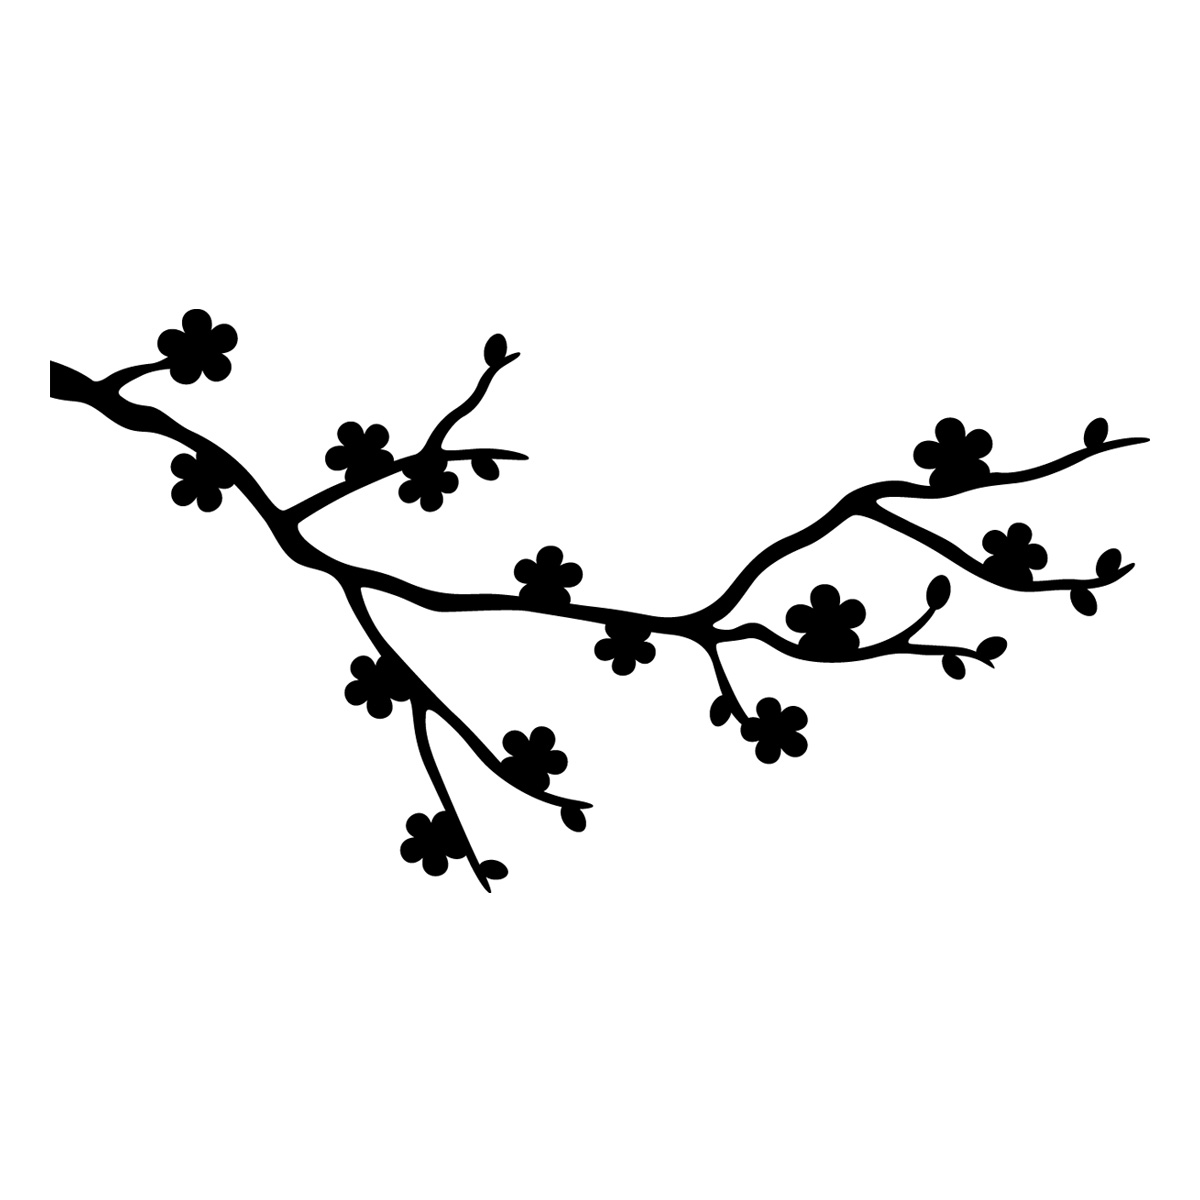 Blossom Wall Stickers Stickers Ordinateurs Portables Sticker Fleurs De